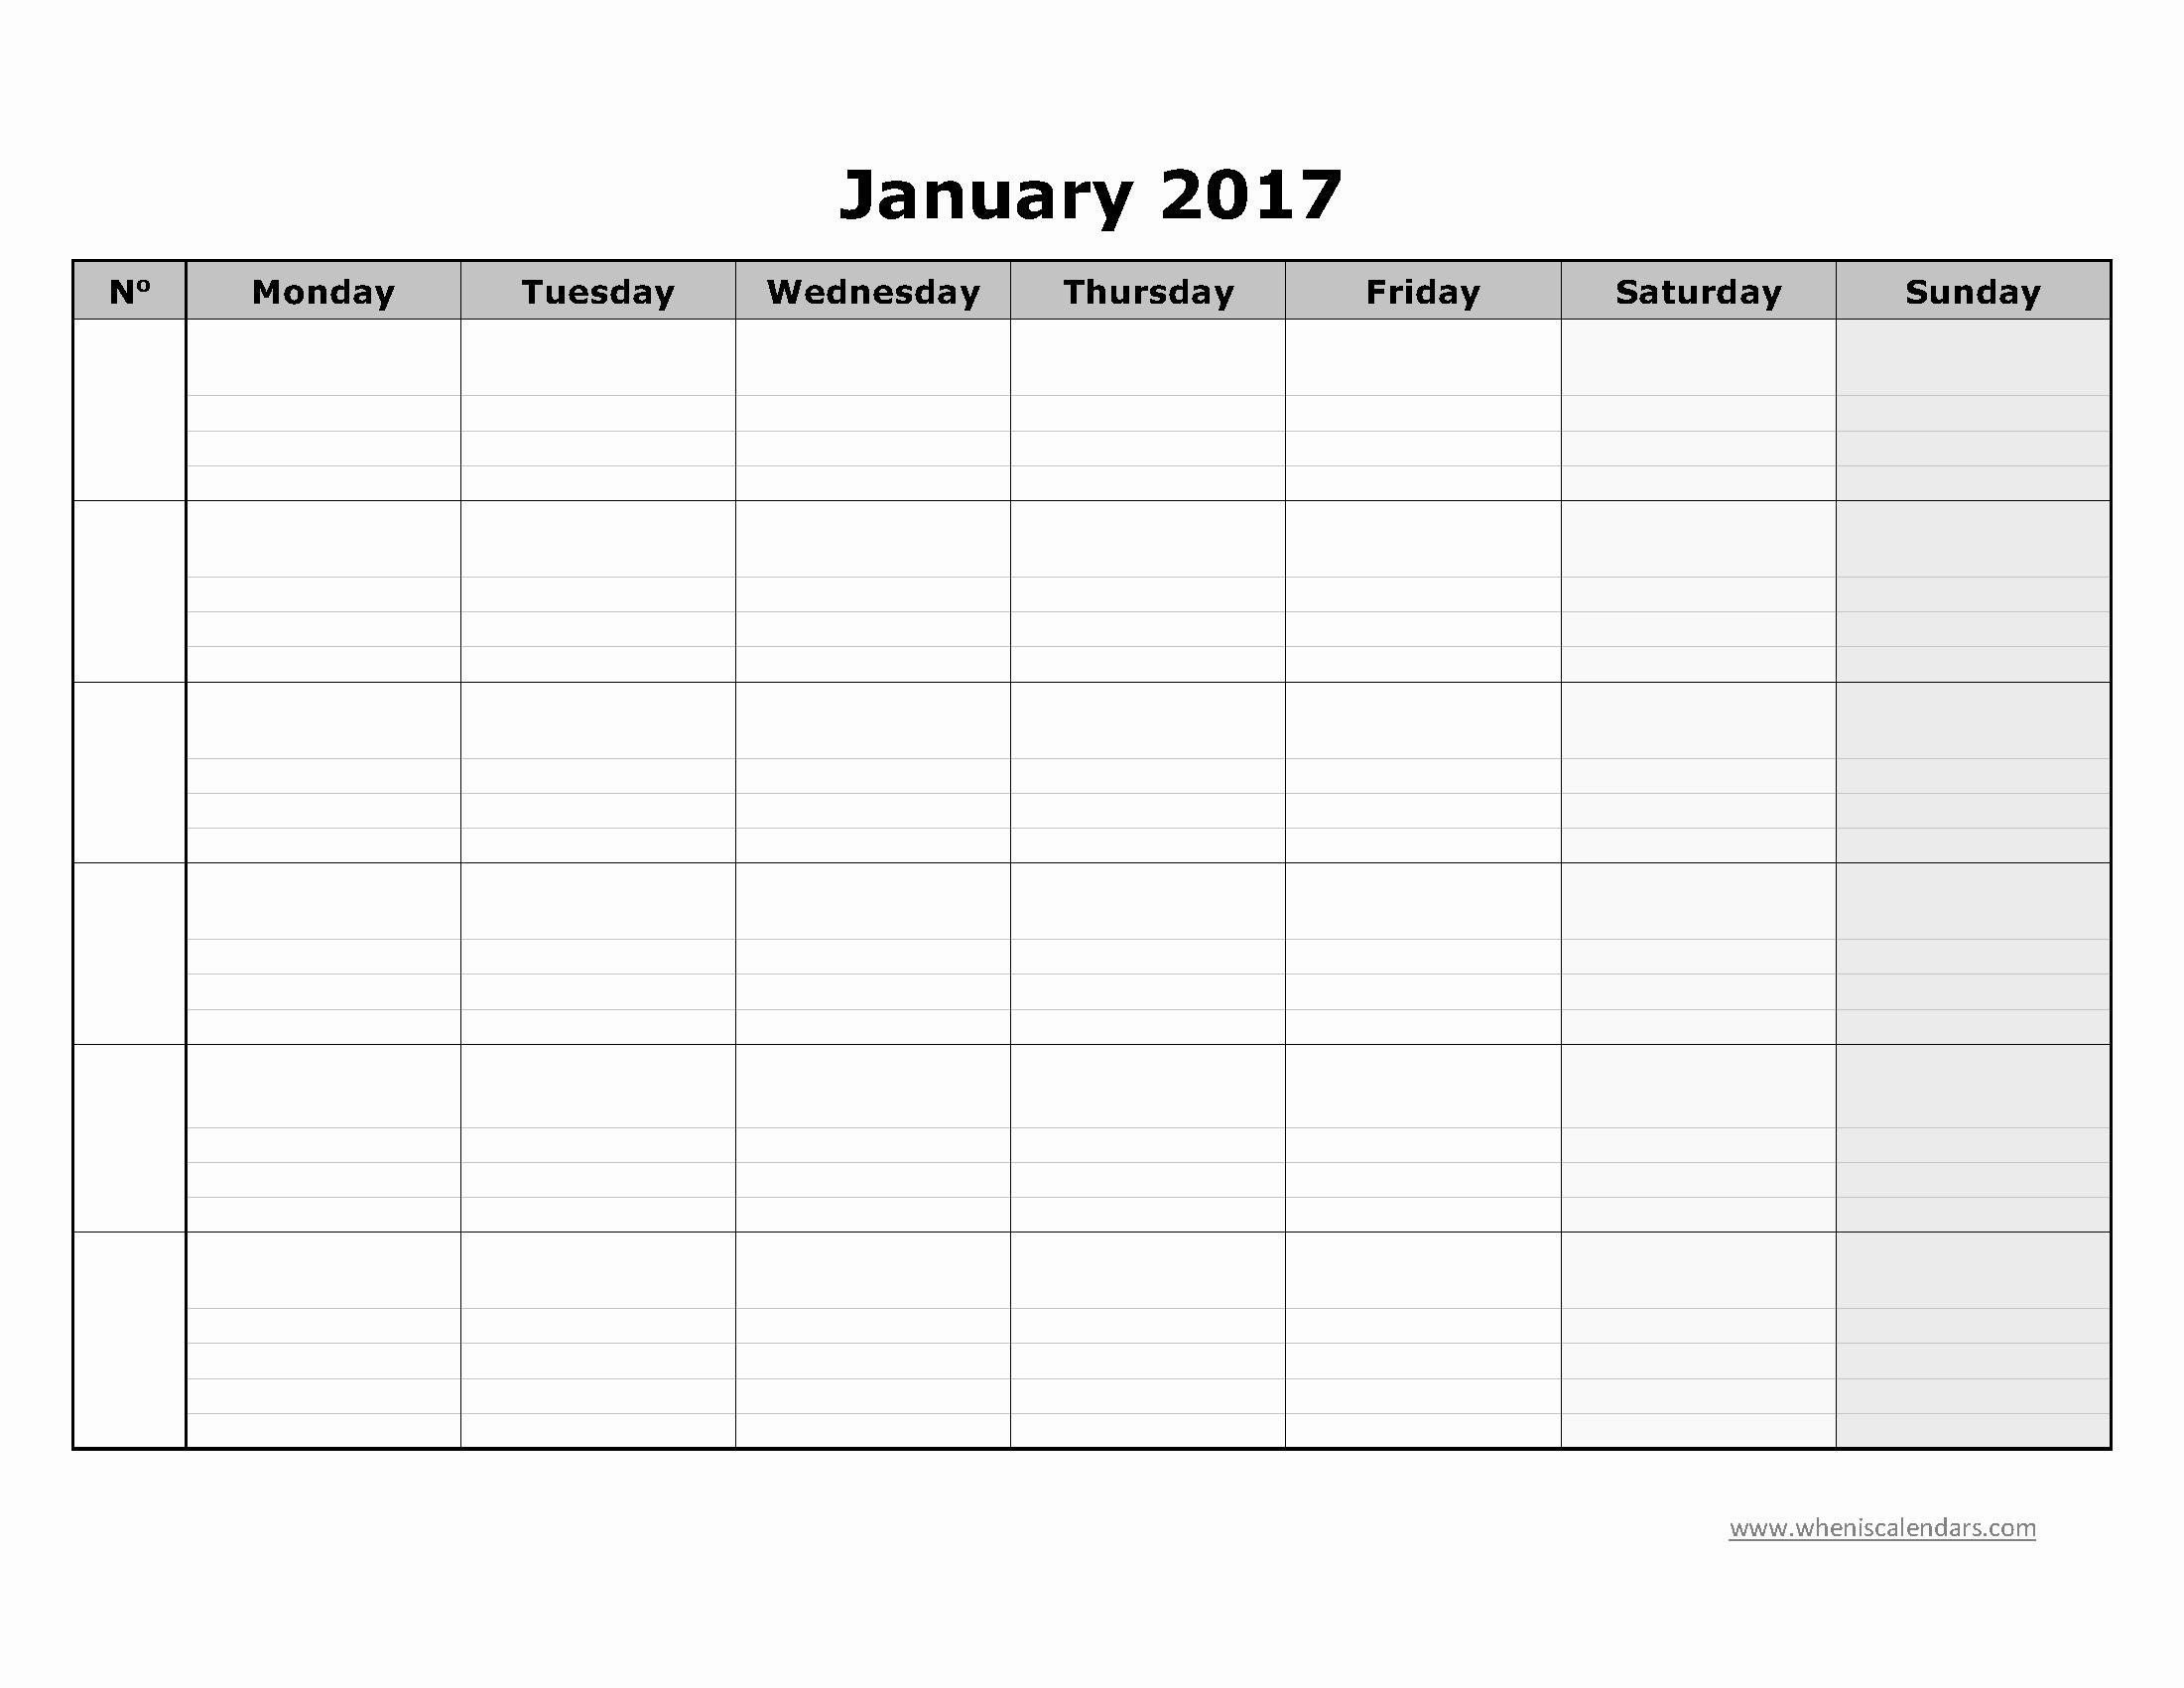 Blank May Calendar 2017 Printable New Blank January 2017 Calendar Templates Printable Pdf